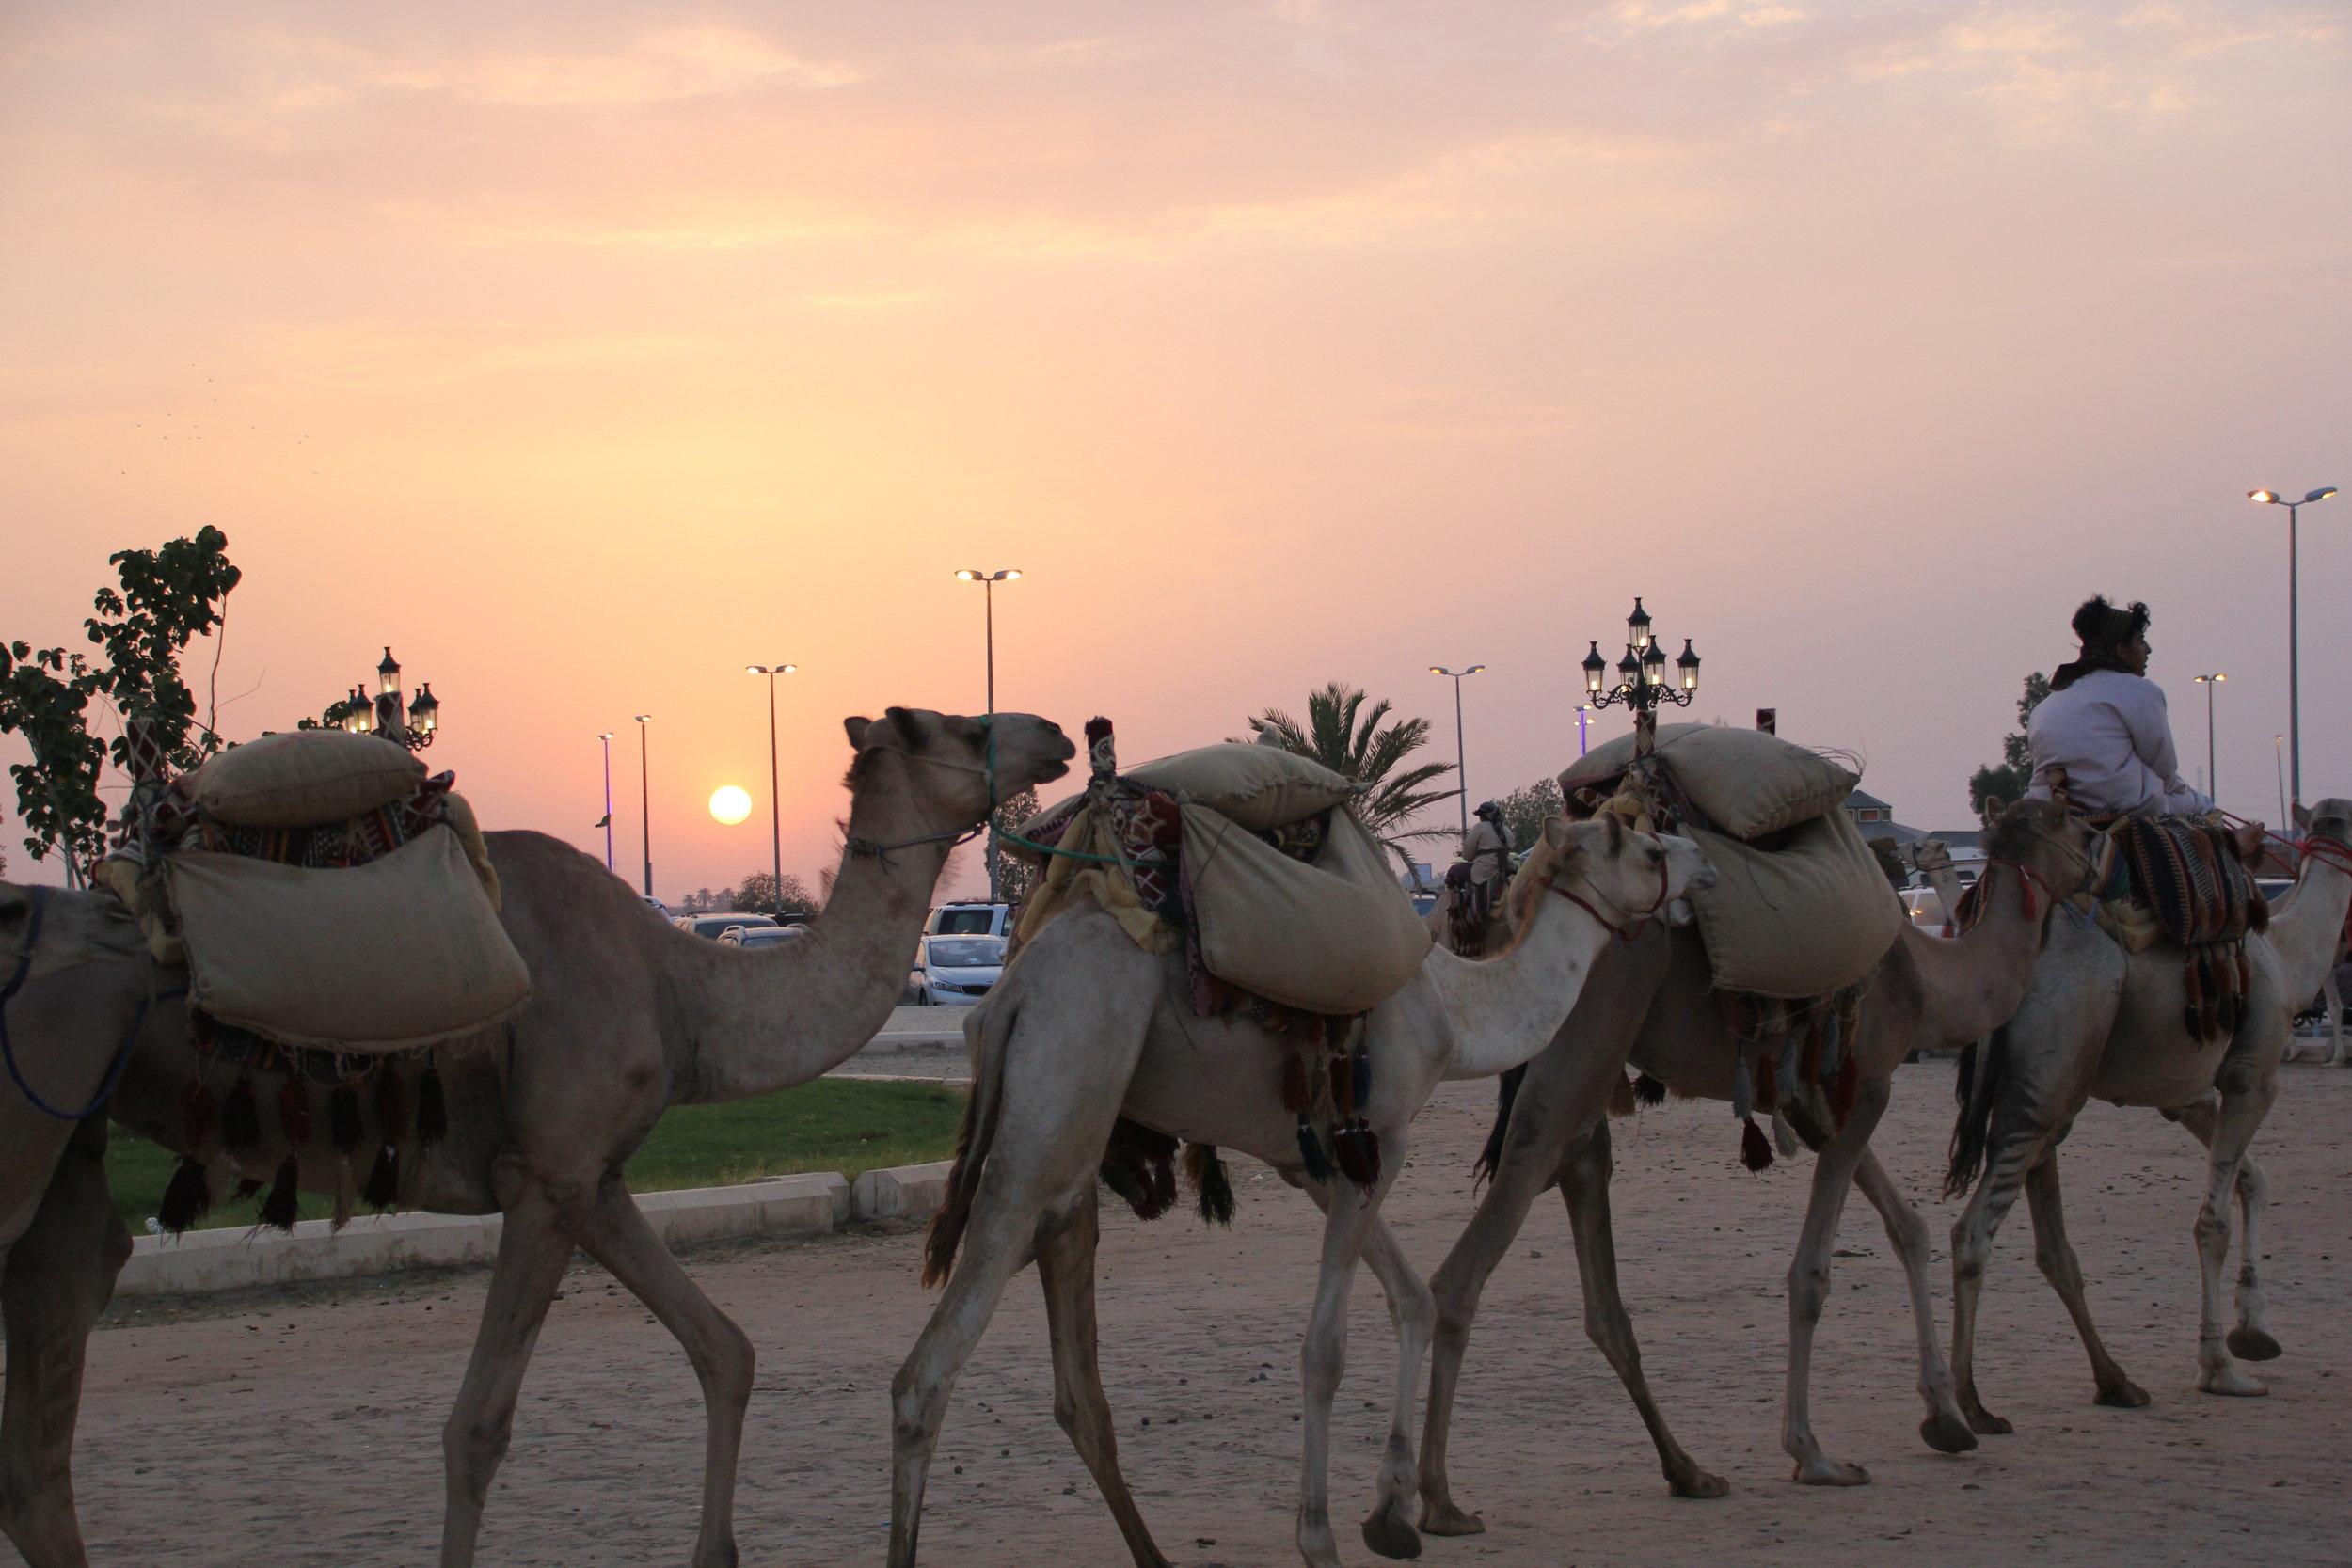 The camel caravan.